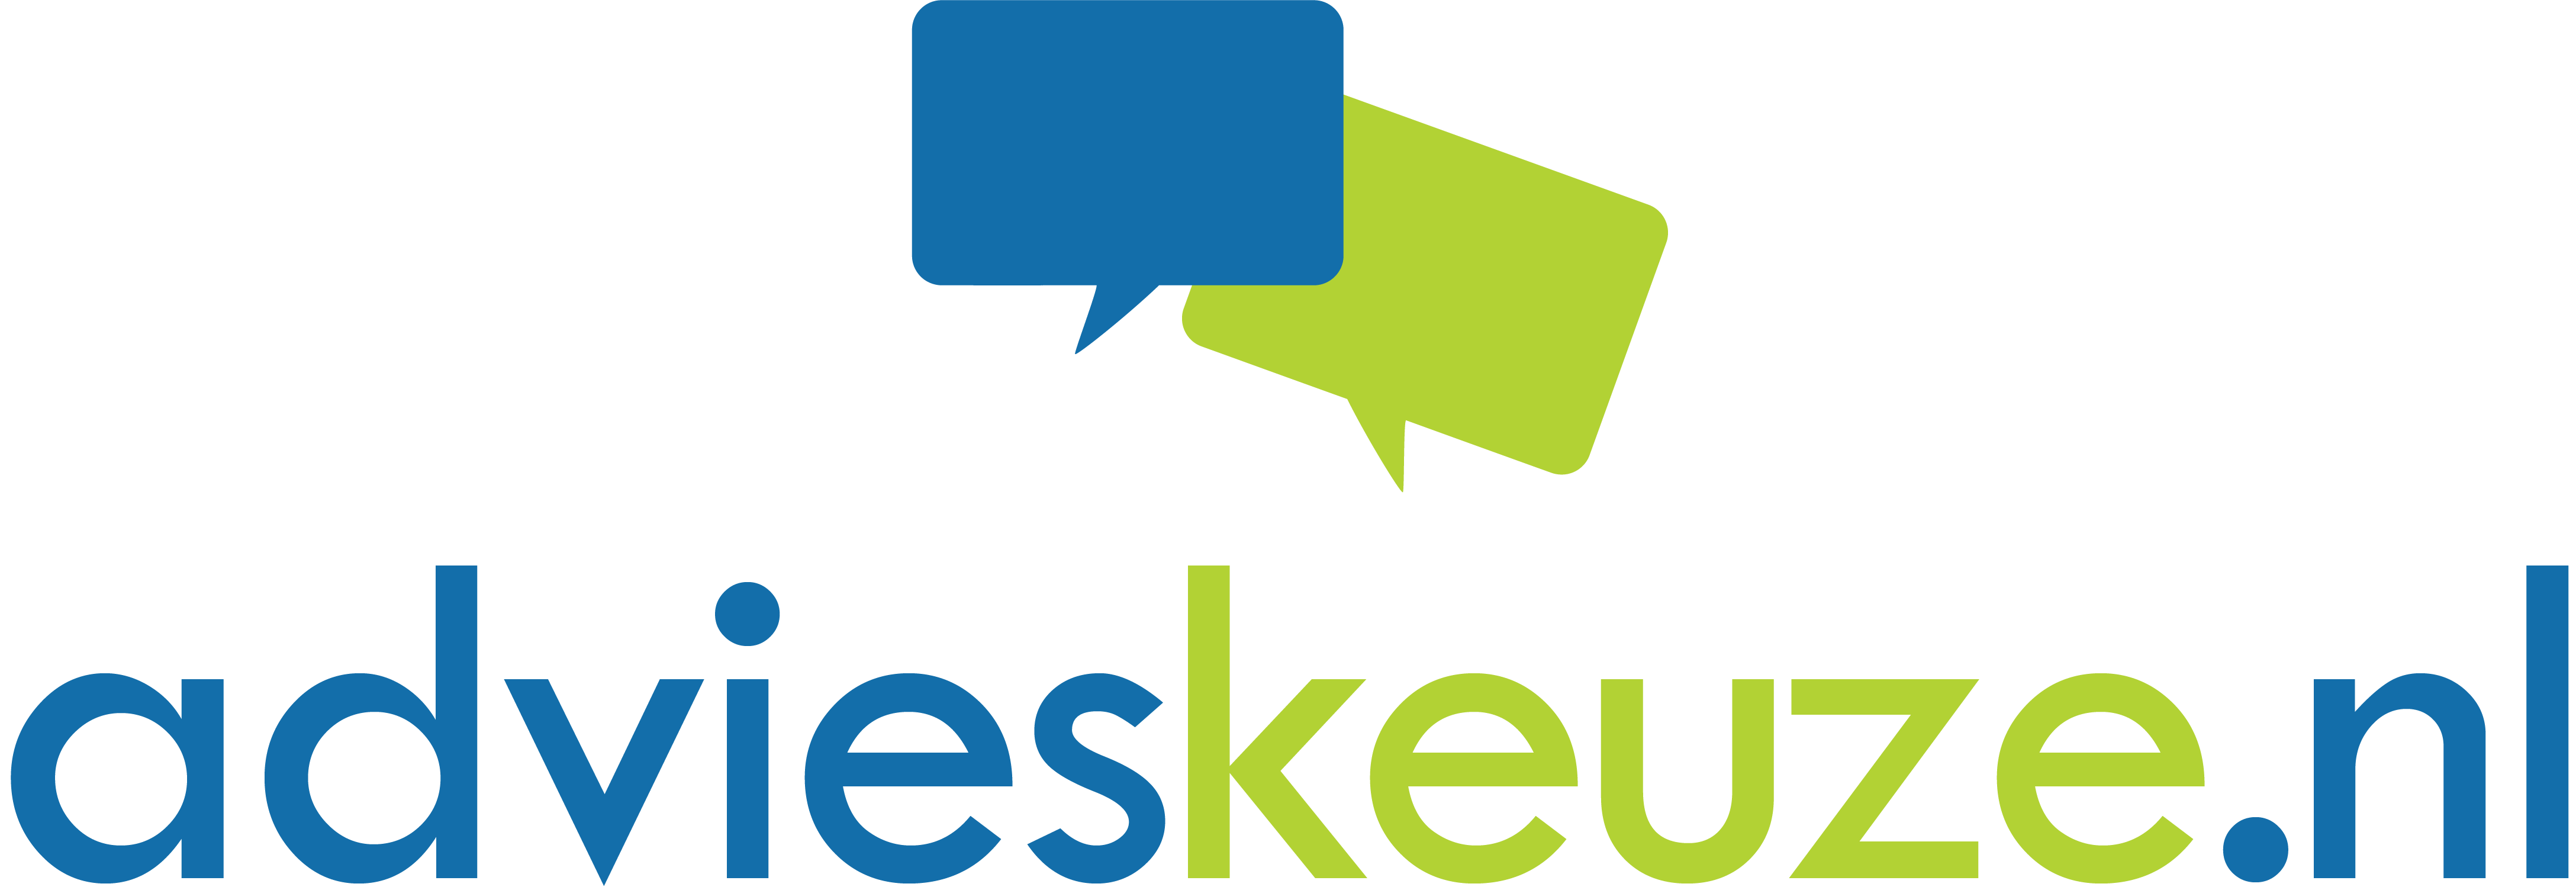 Advieskeuze logo liggend